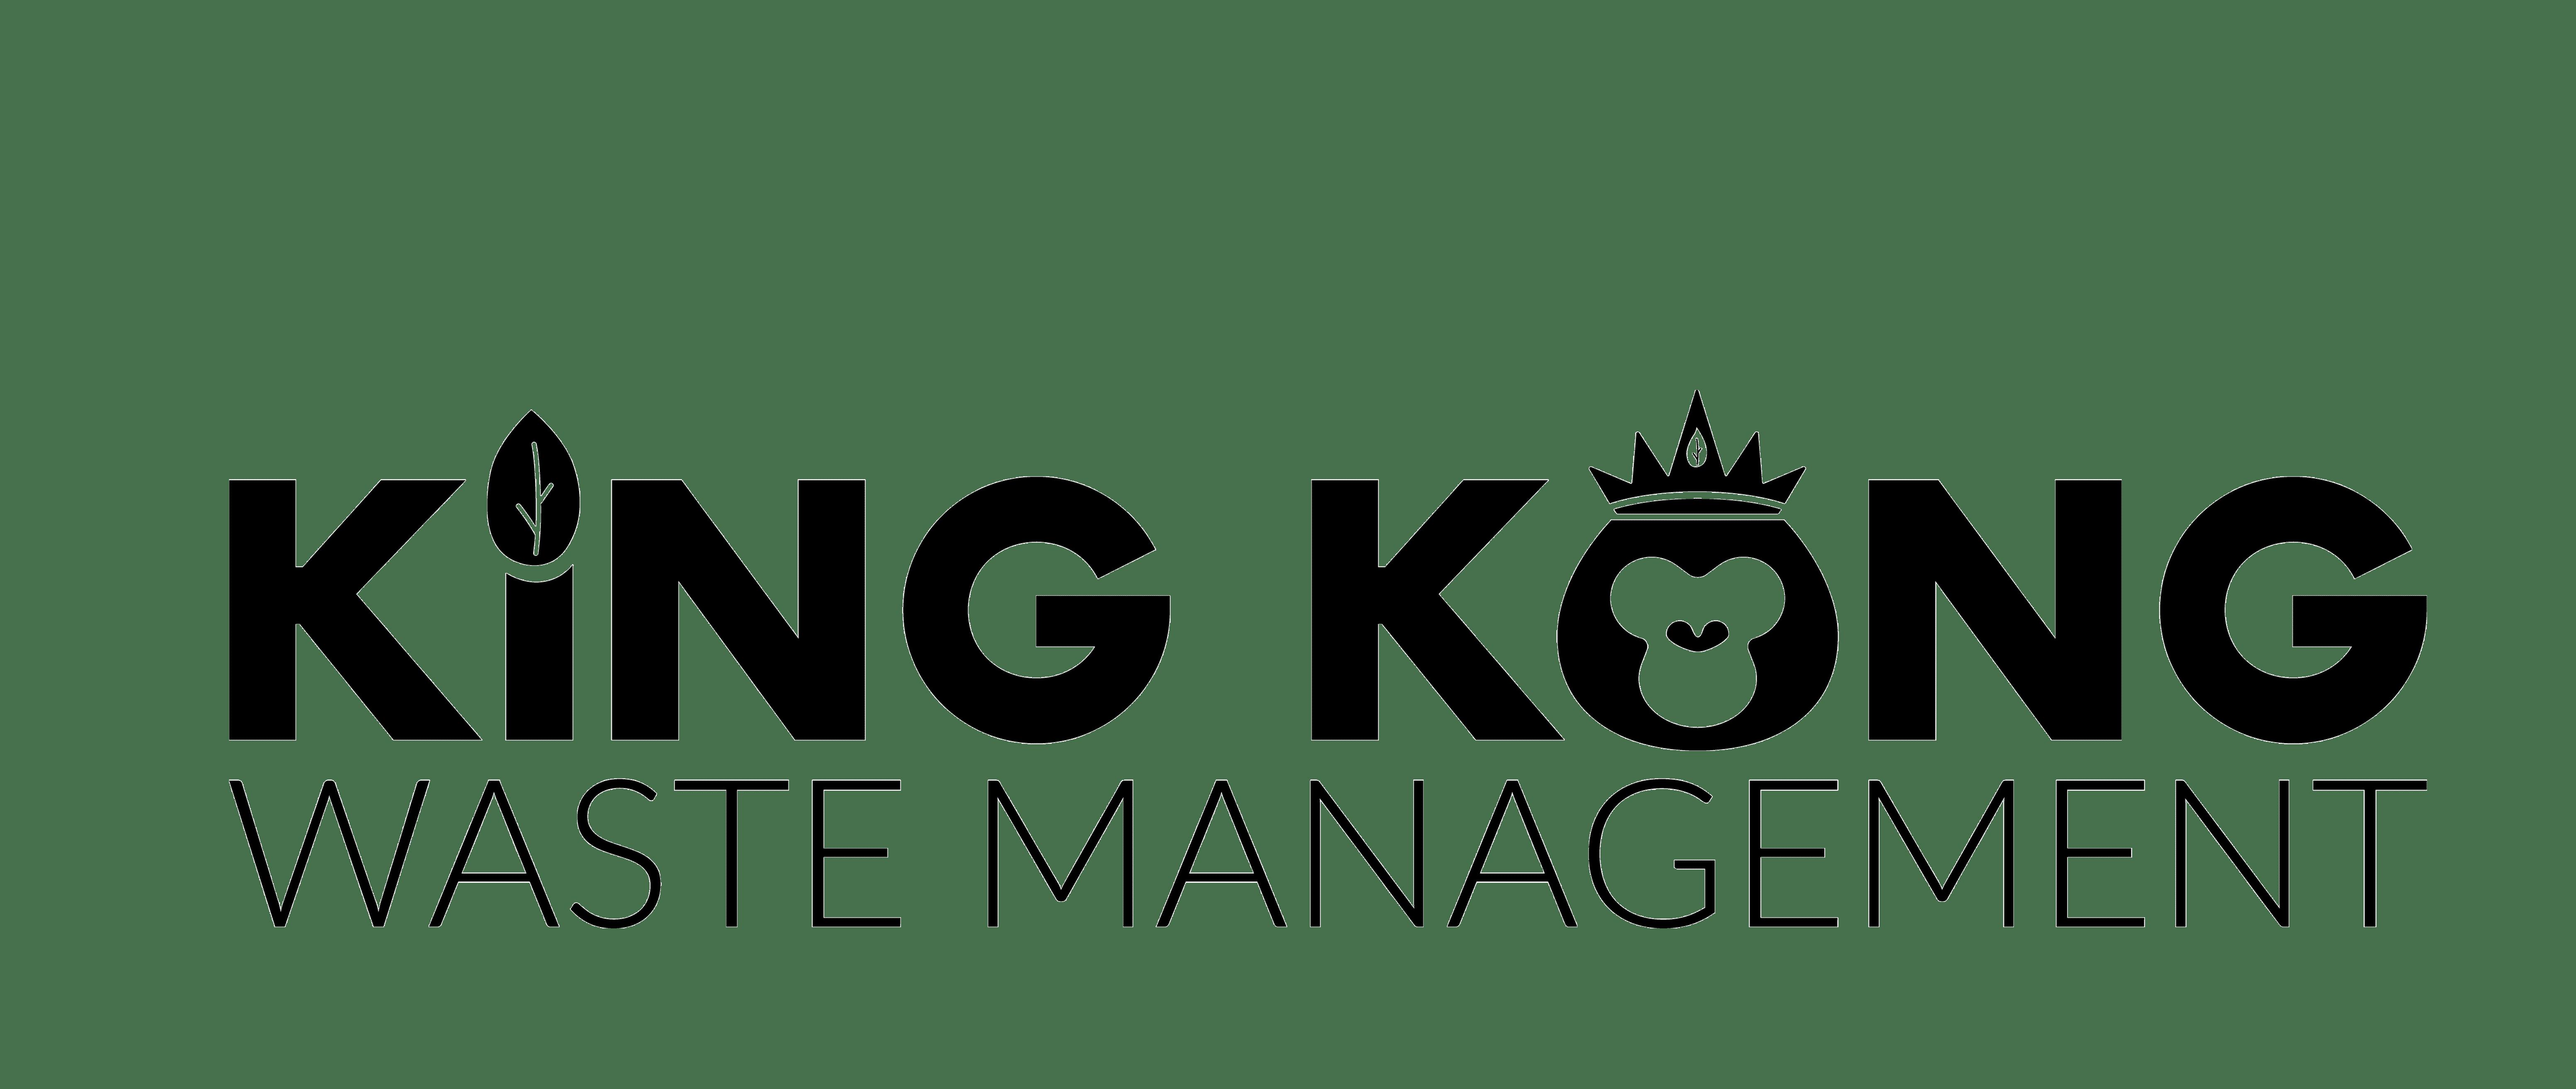 King Kong Waste Management